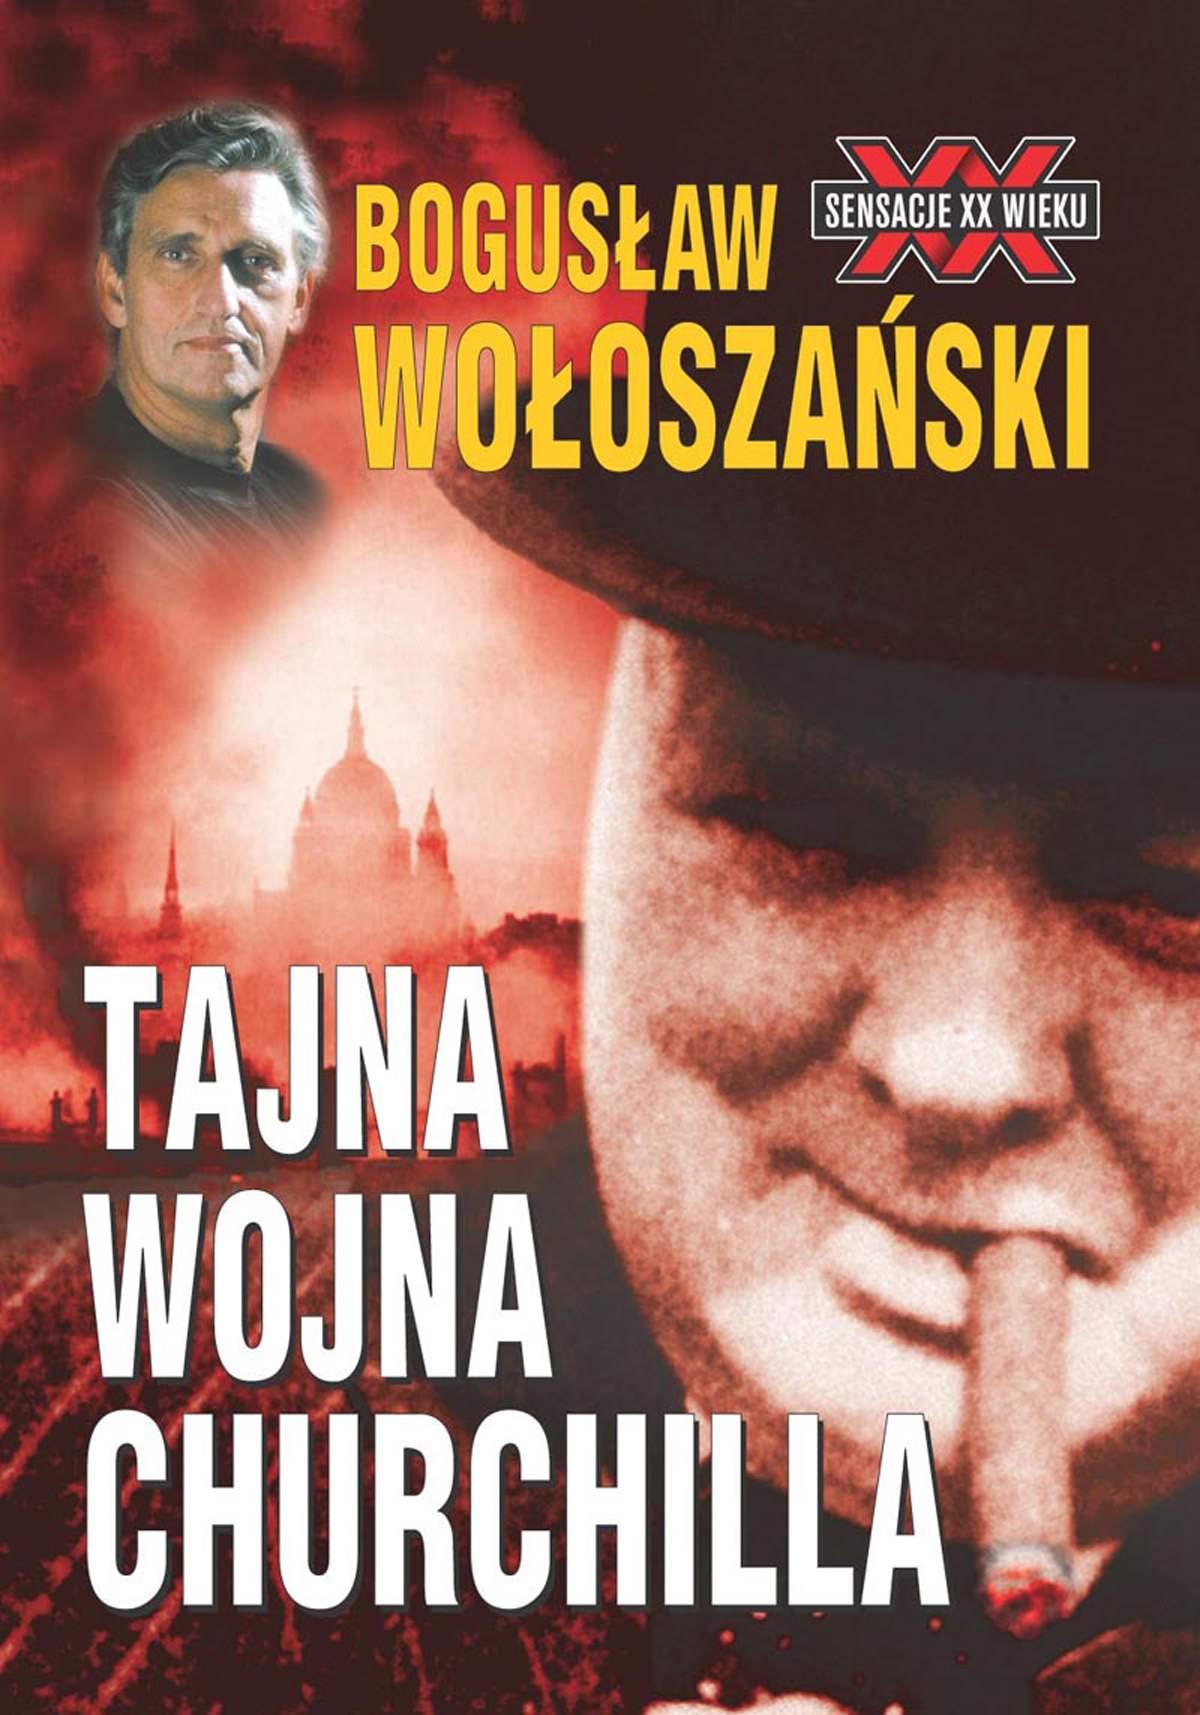 Tajna Wojna Churchilla - Ebook (Książka na Kindle) do pobrania w formacie MOBI